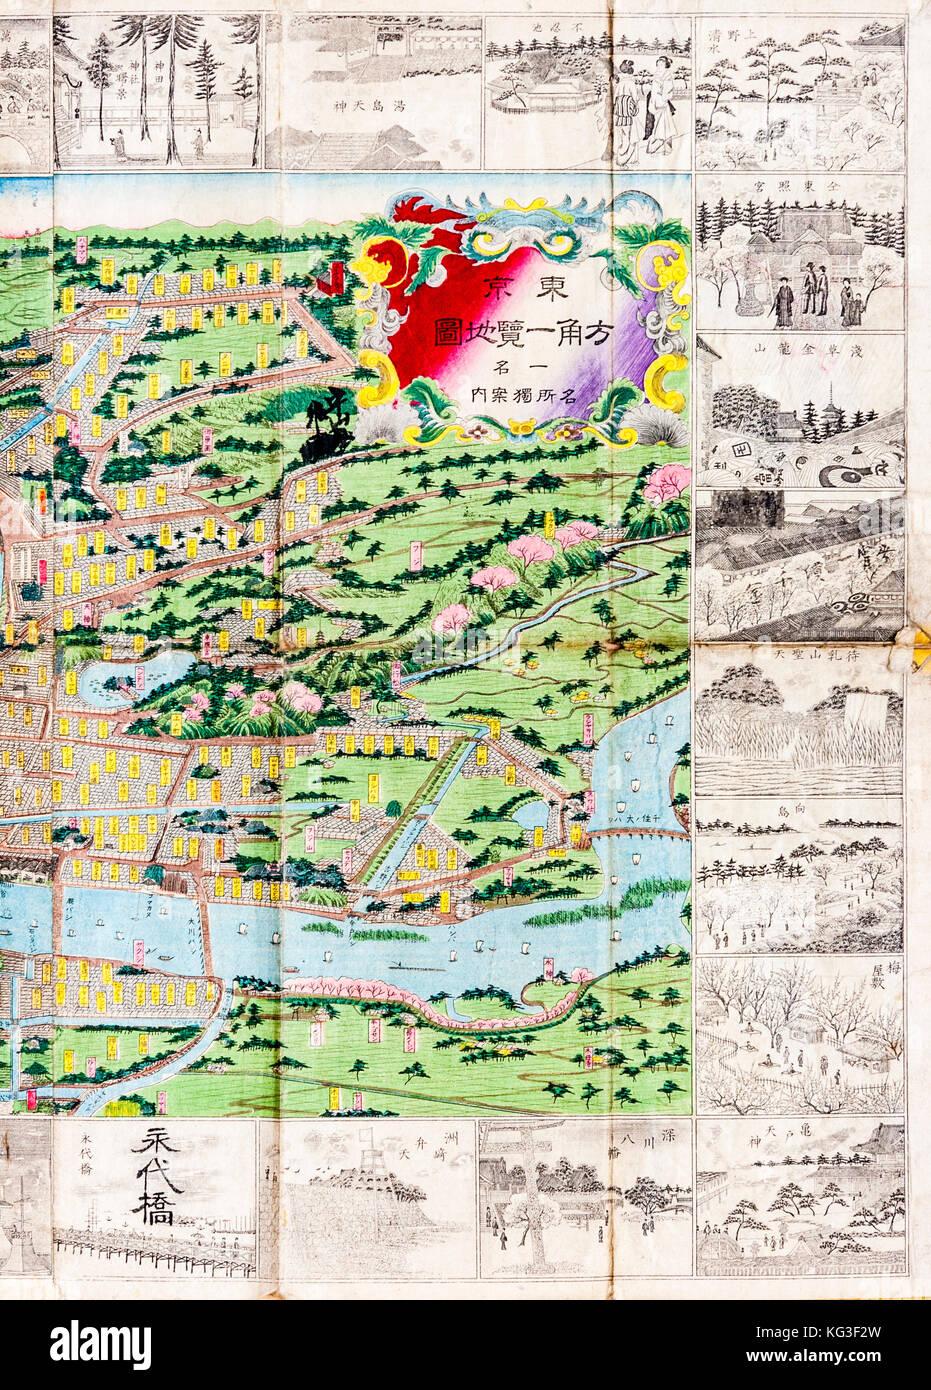 Map japan tokyo stock photos map japan tokyo stock images alamy japan tokyo 1882 colour map of tokyo edo with edge drawn black gumiabroncs Choice Image